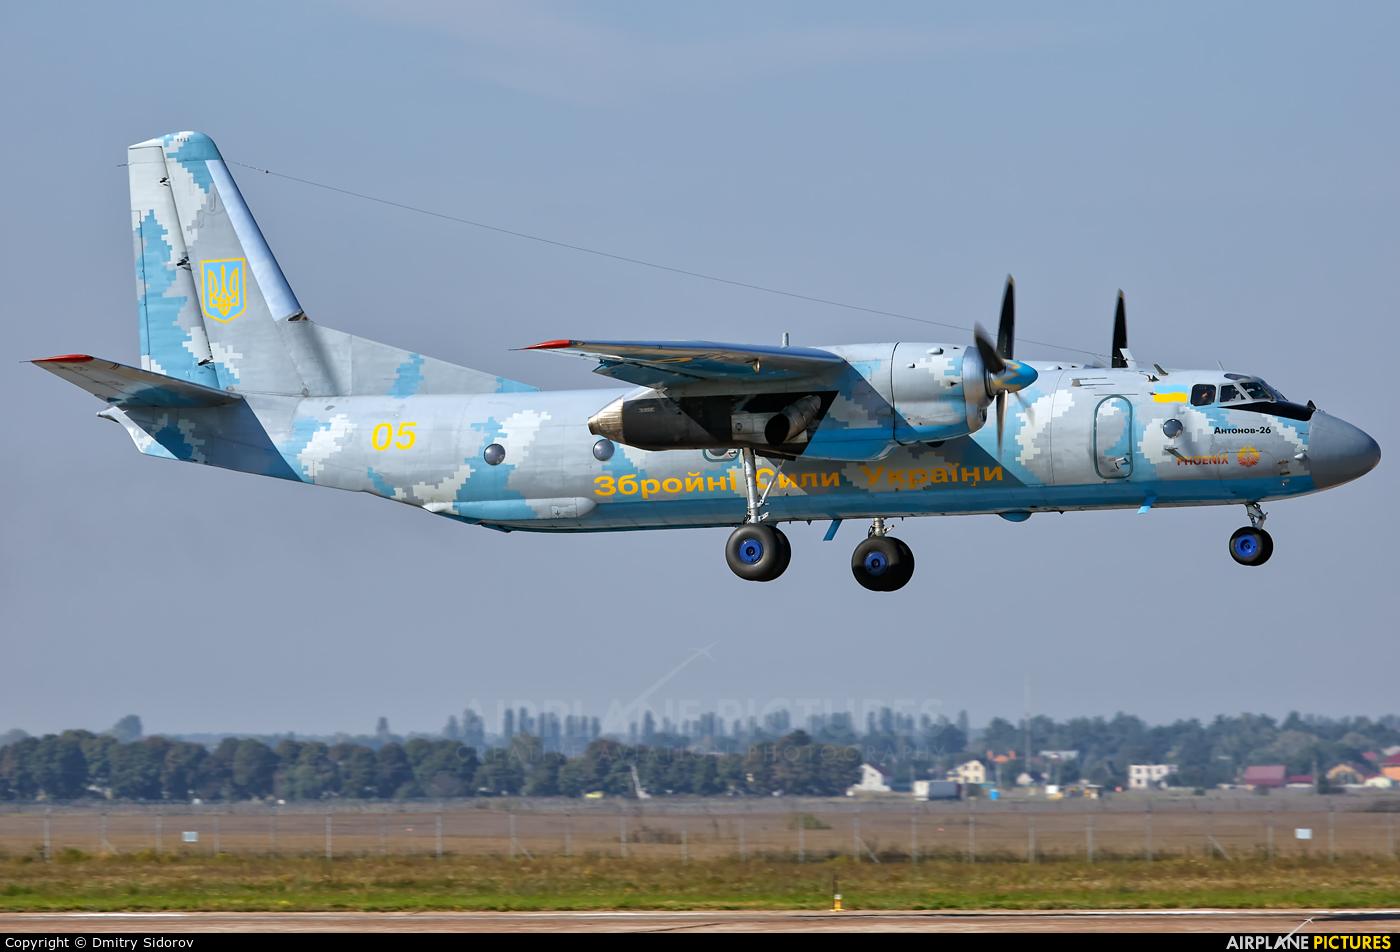 Ukraine - Air Force 05 aircraft at Kiev - Borispol